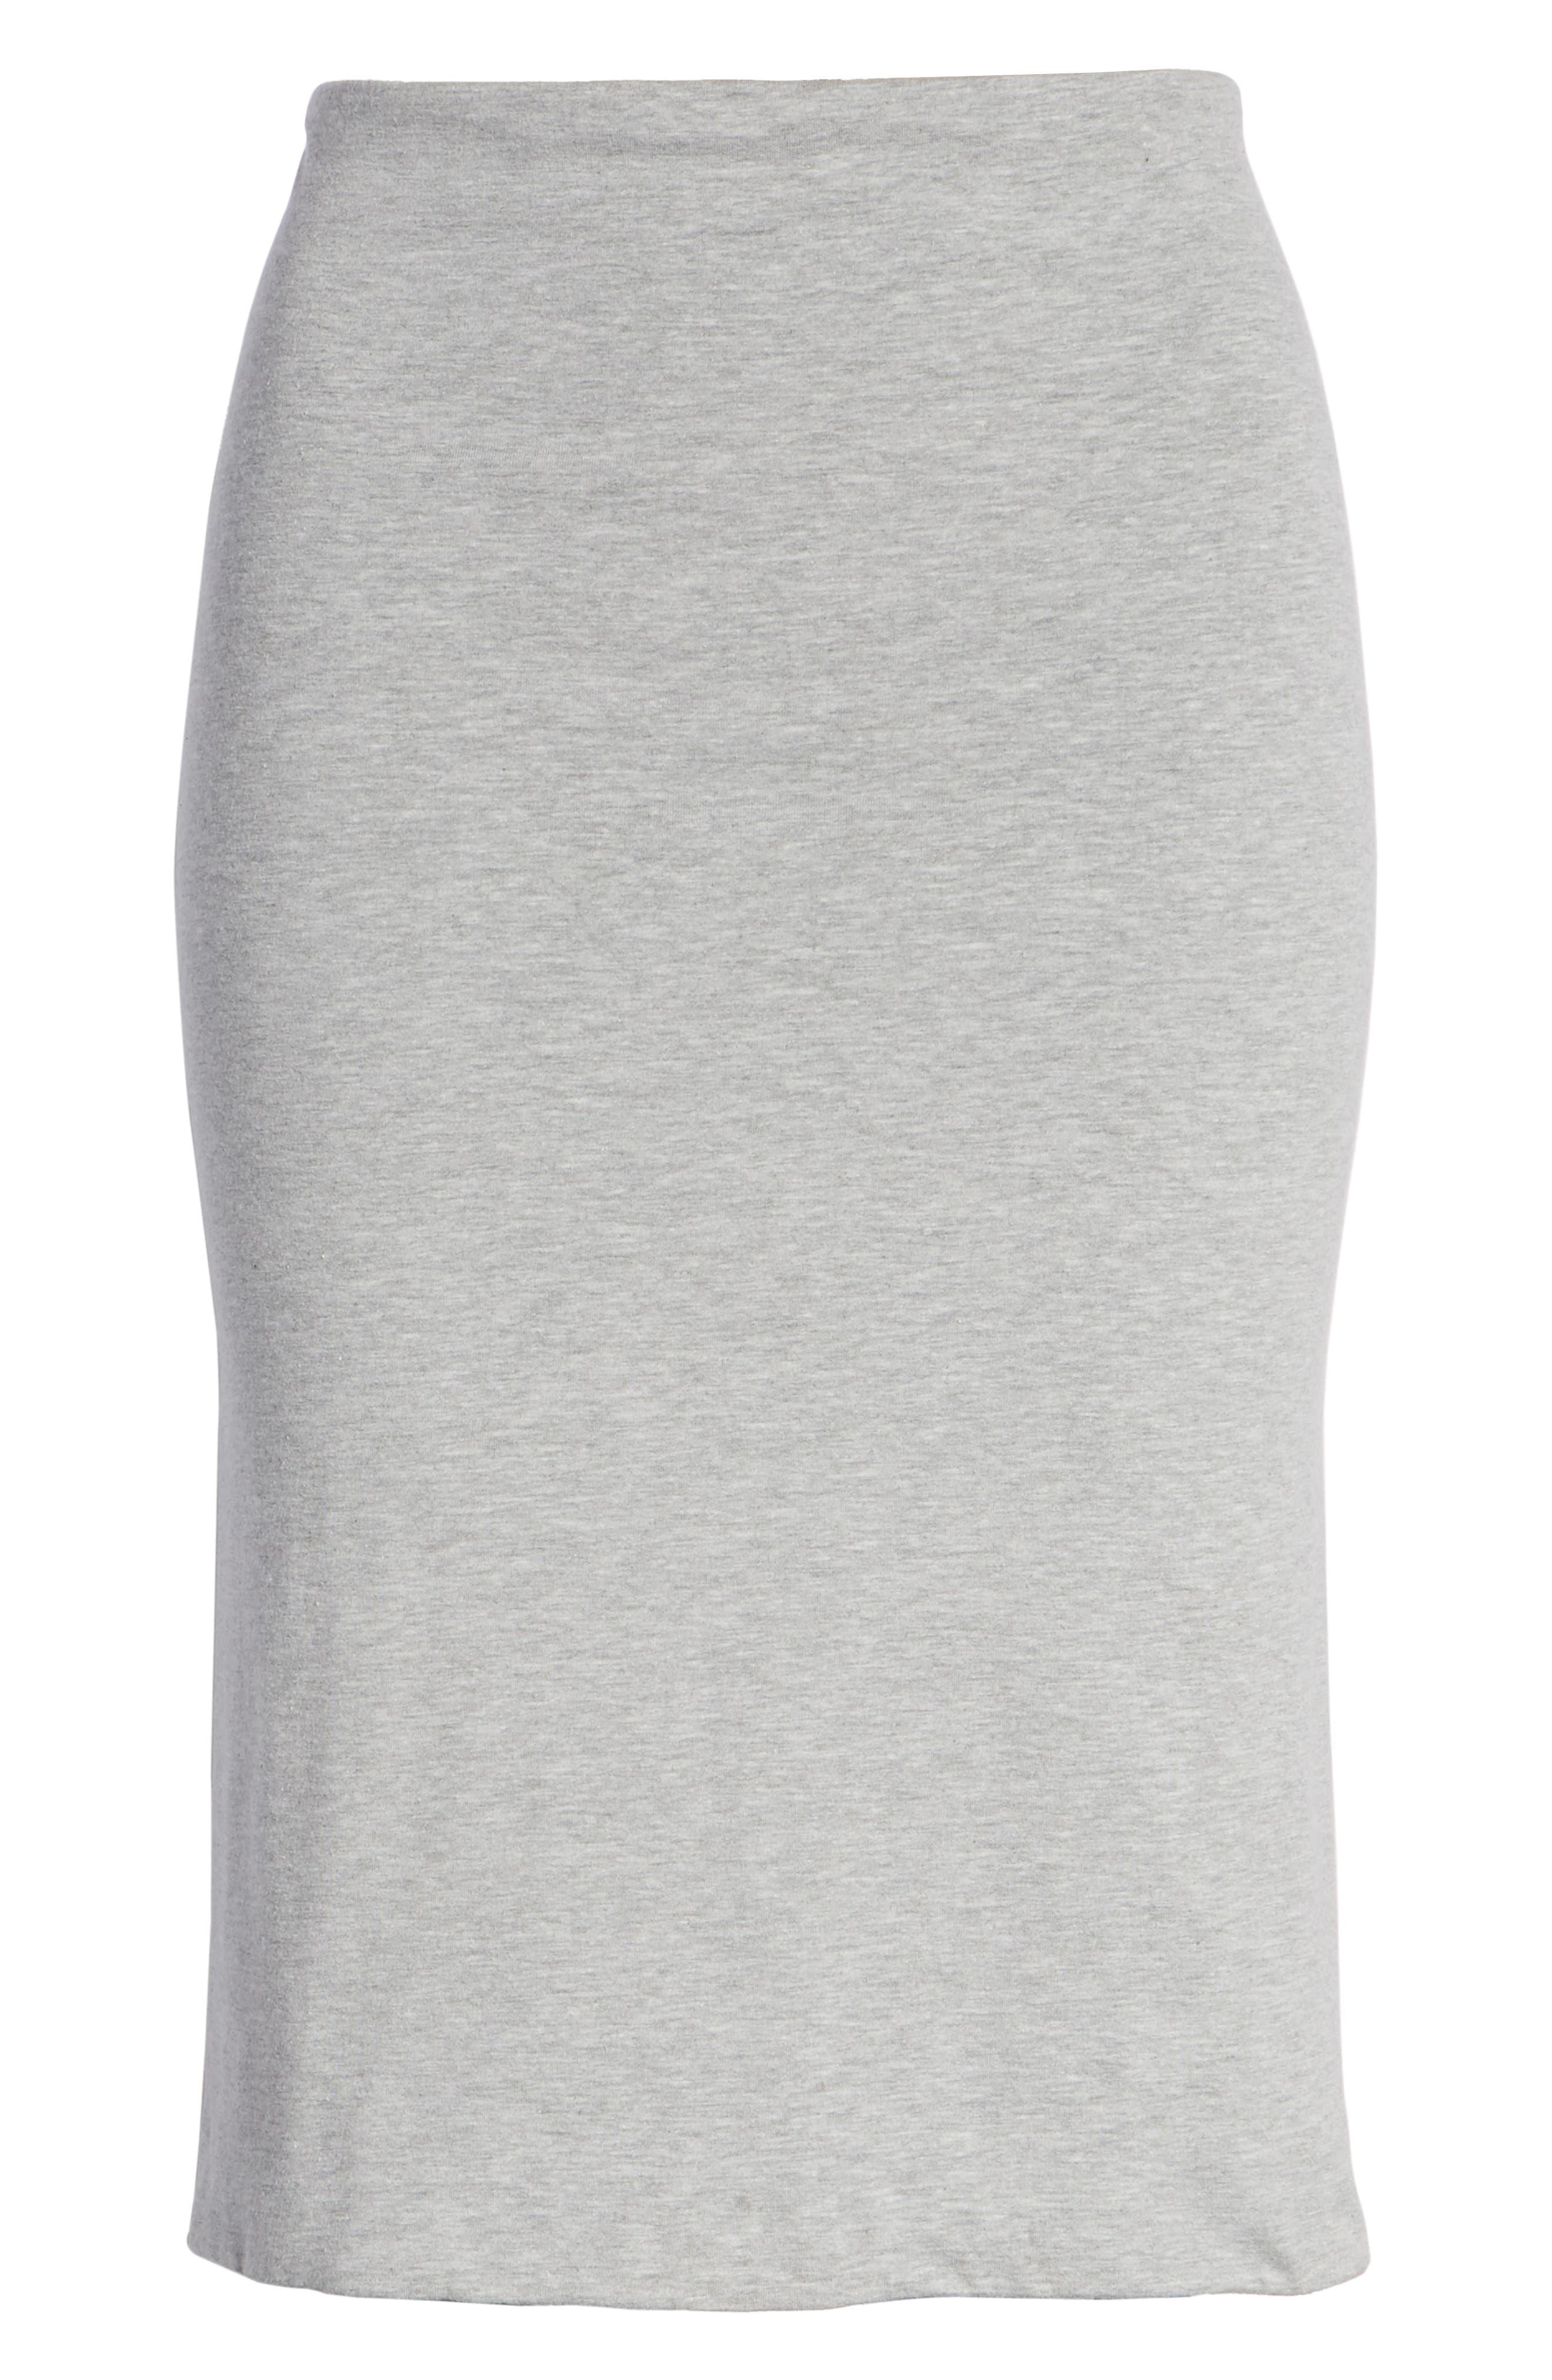 x Hi Sugarplum! Fornillo Pencil Skirt,                             Alternate thumbnail 6, color,                             055